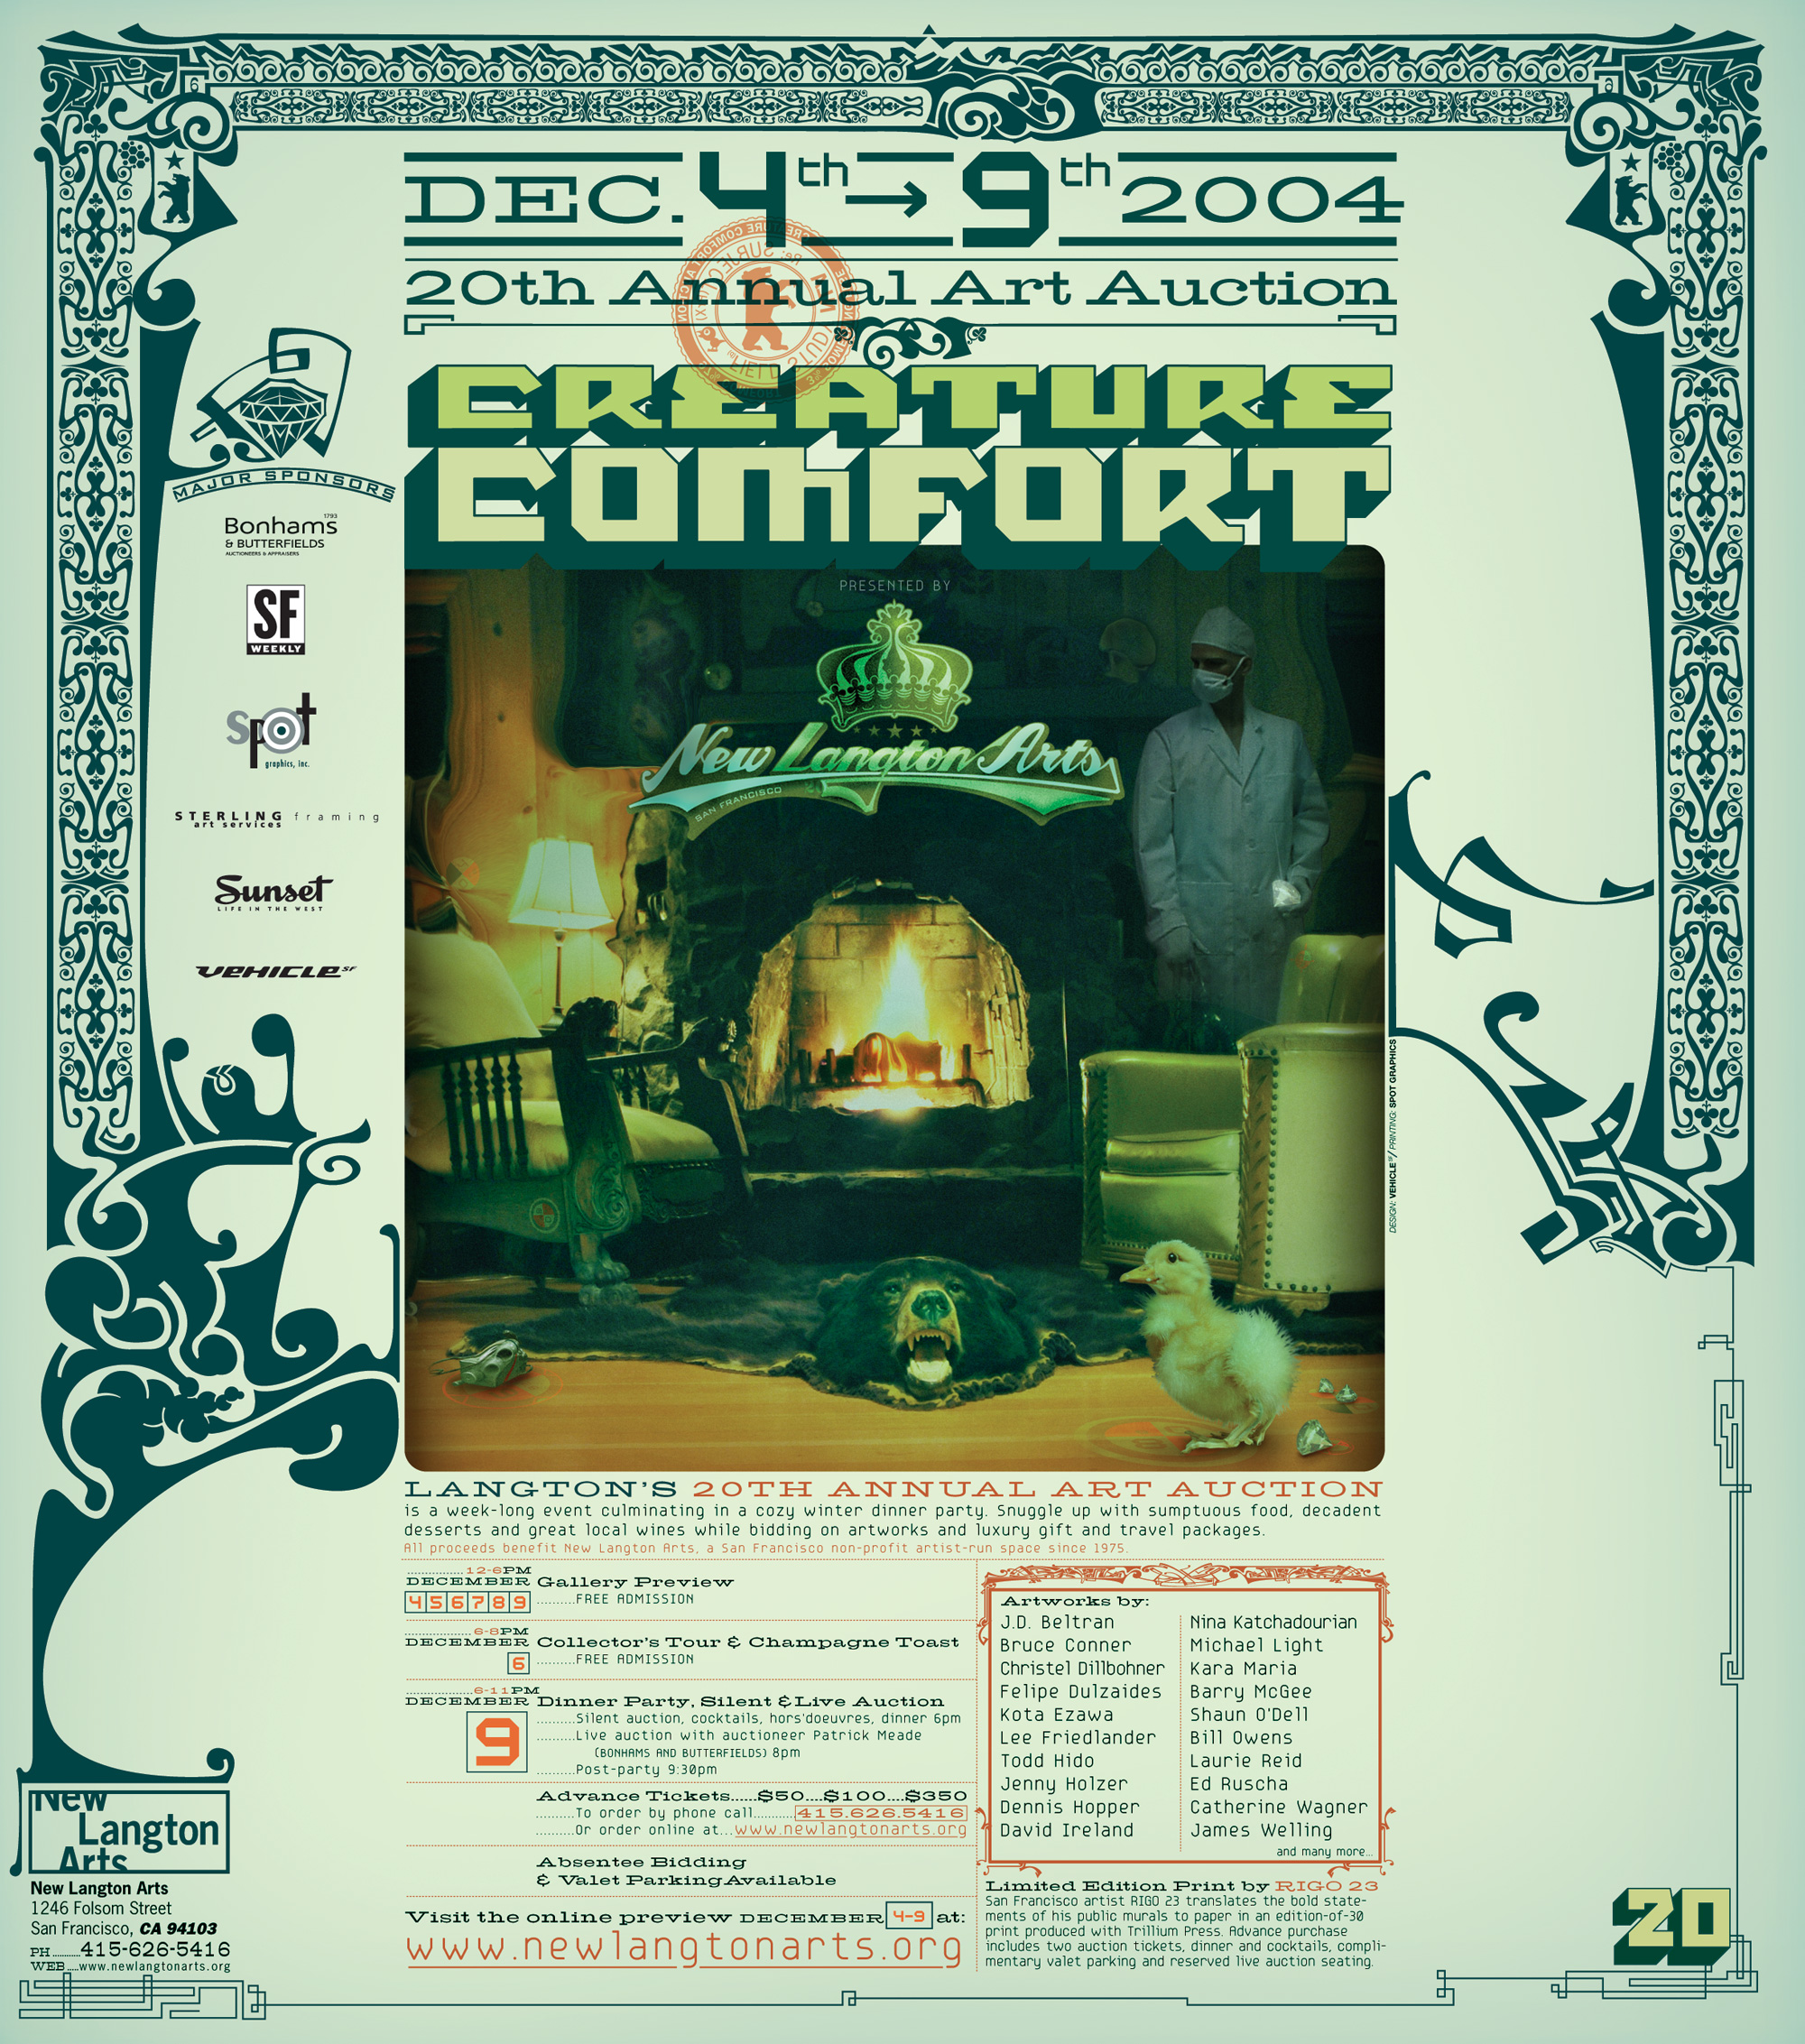 NLA creature comfort poster hires